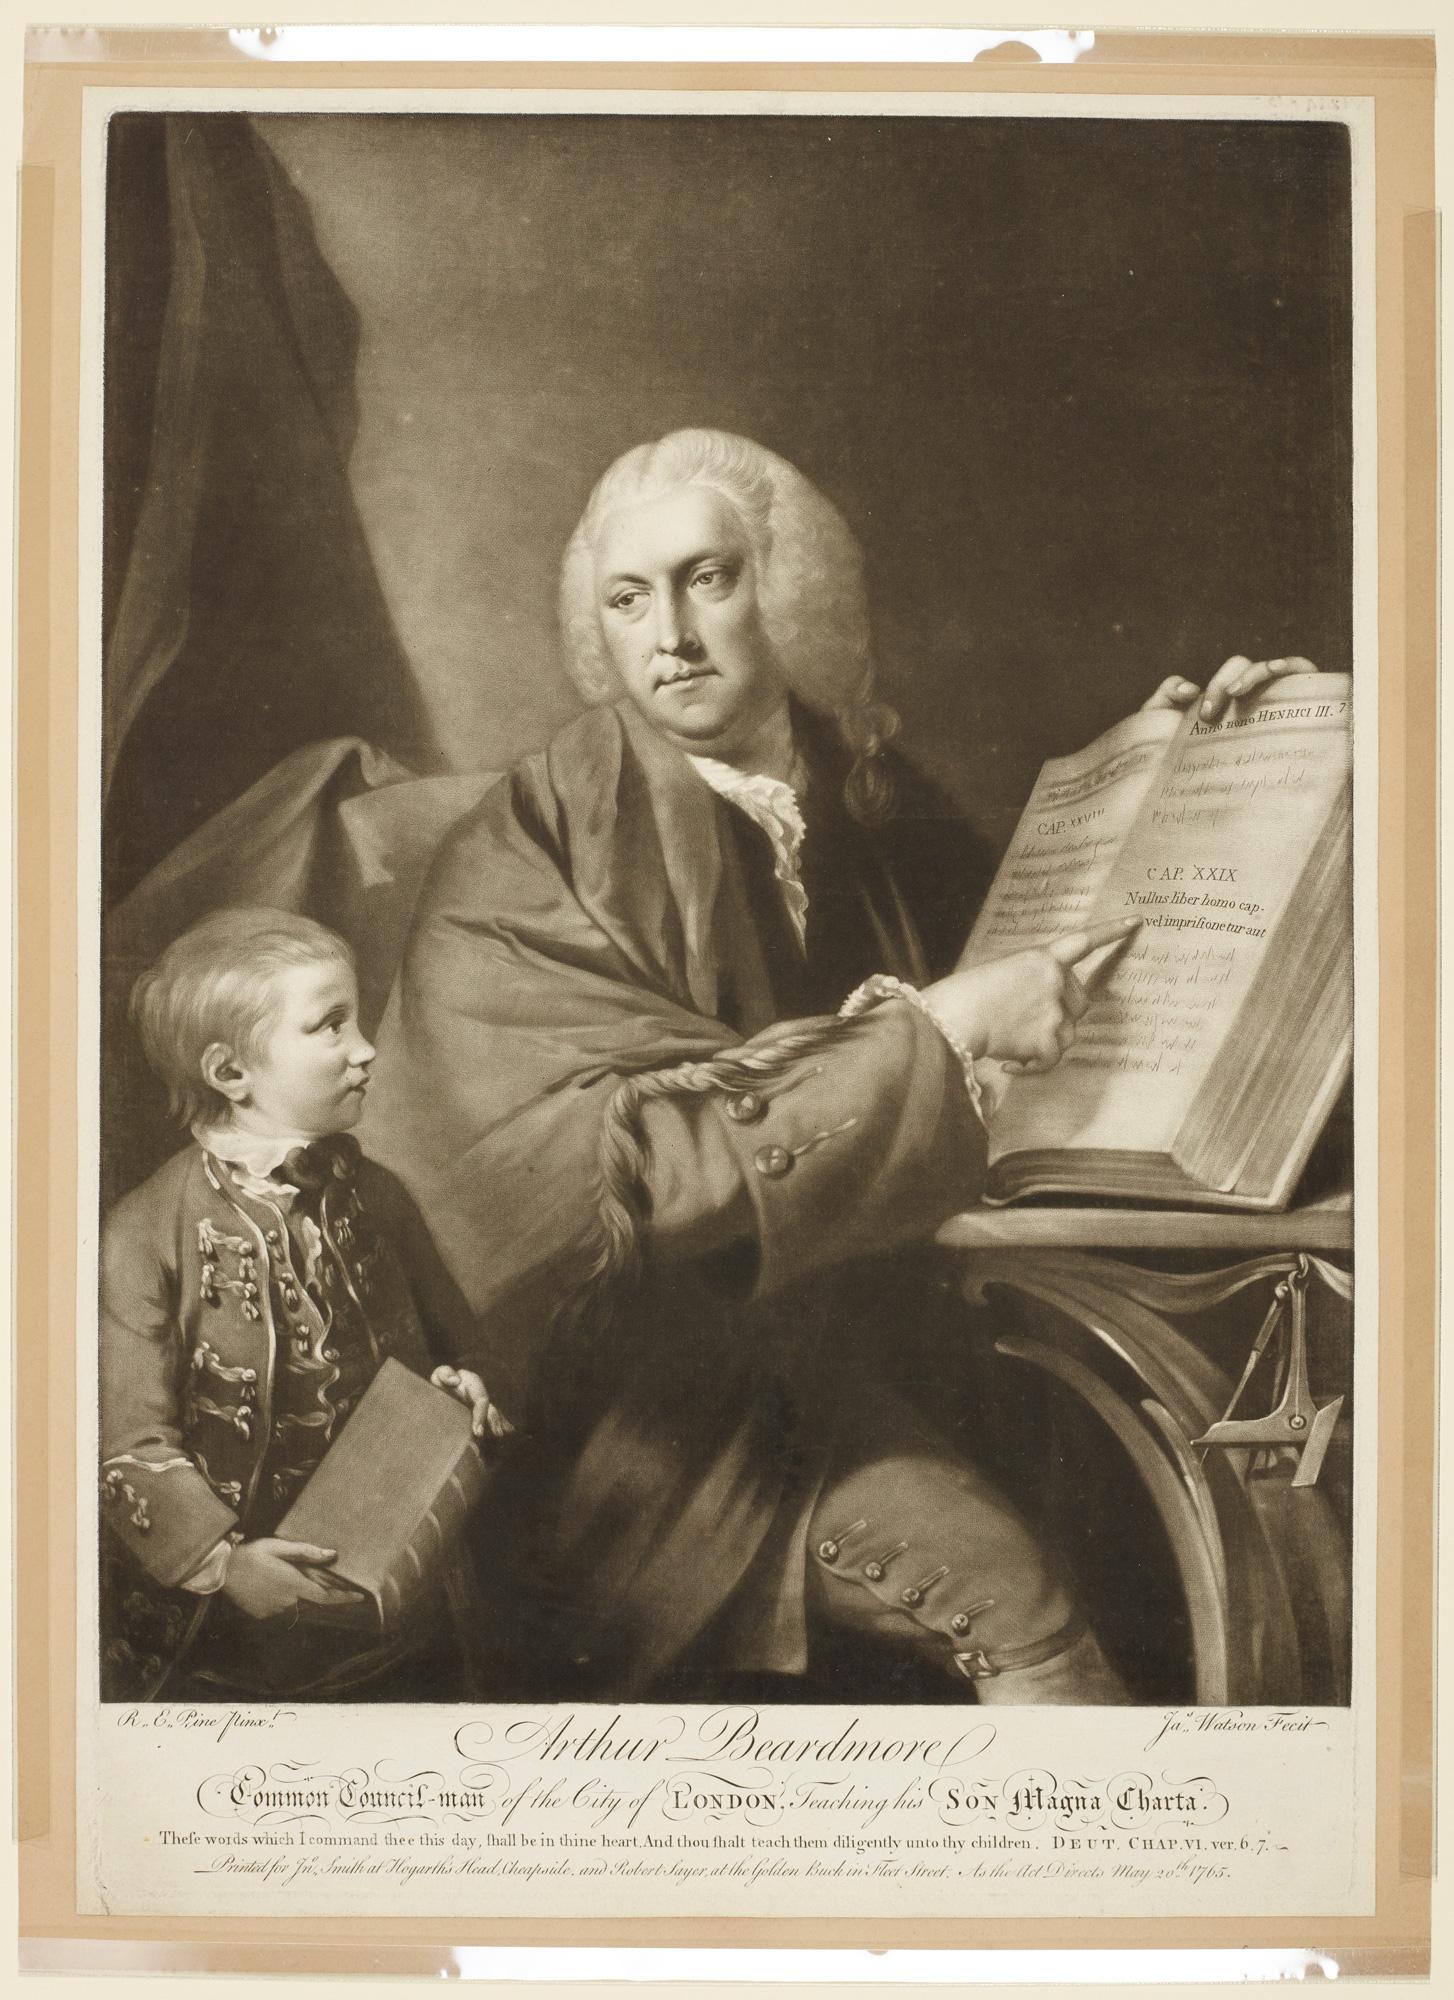 Print of 'Arthur Beardmore Common-Council Man of the City of London, Teaching his Son Magna Carta'